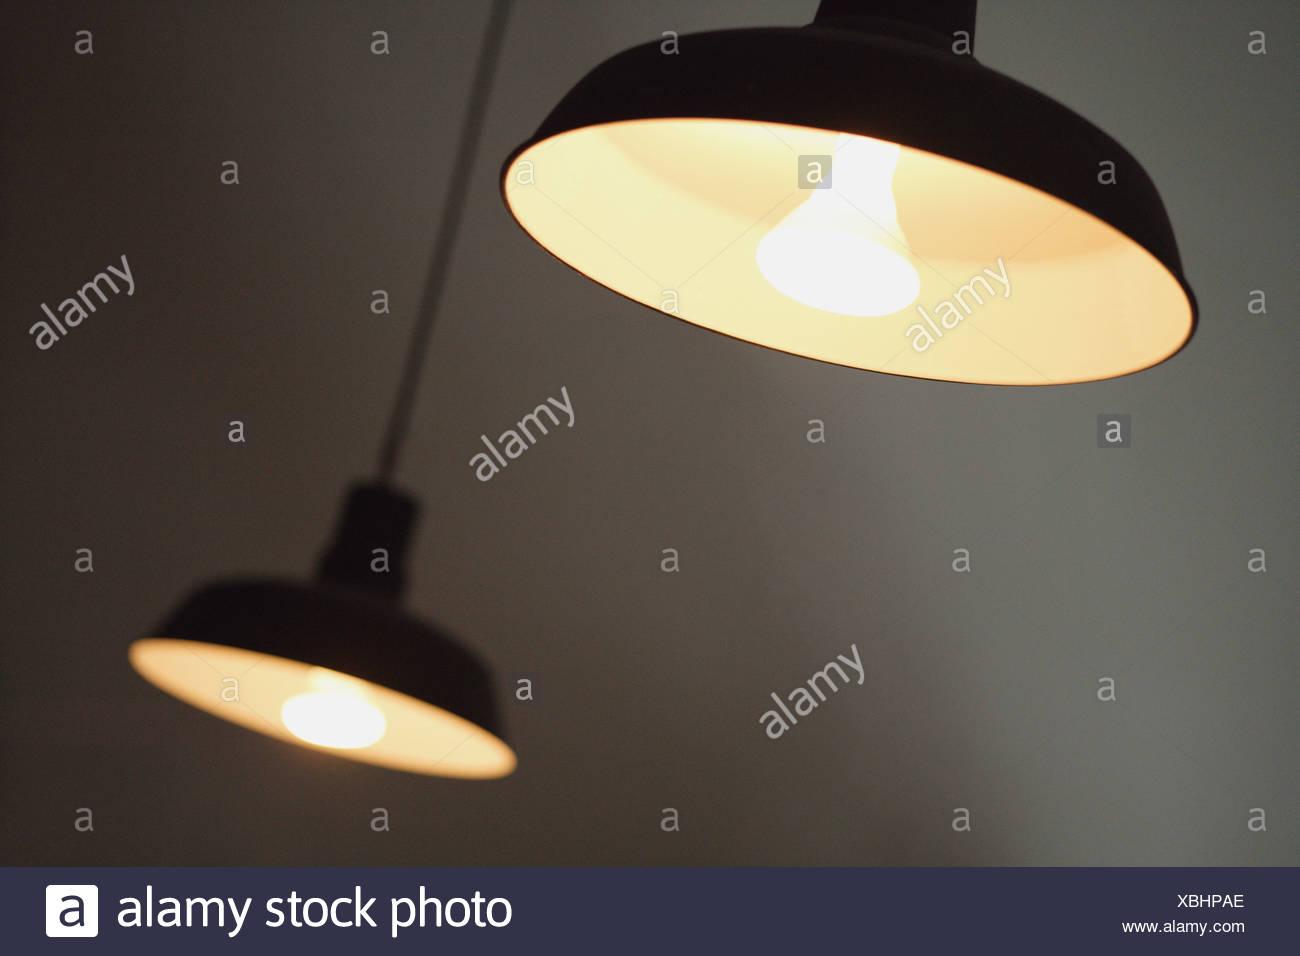 Two pendant light fittings - Stock Image